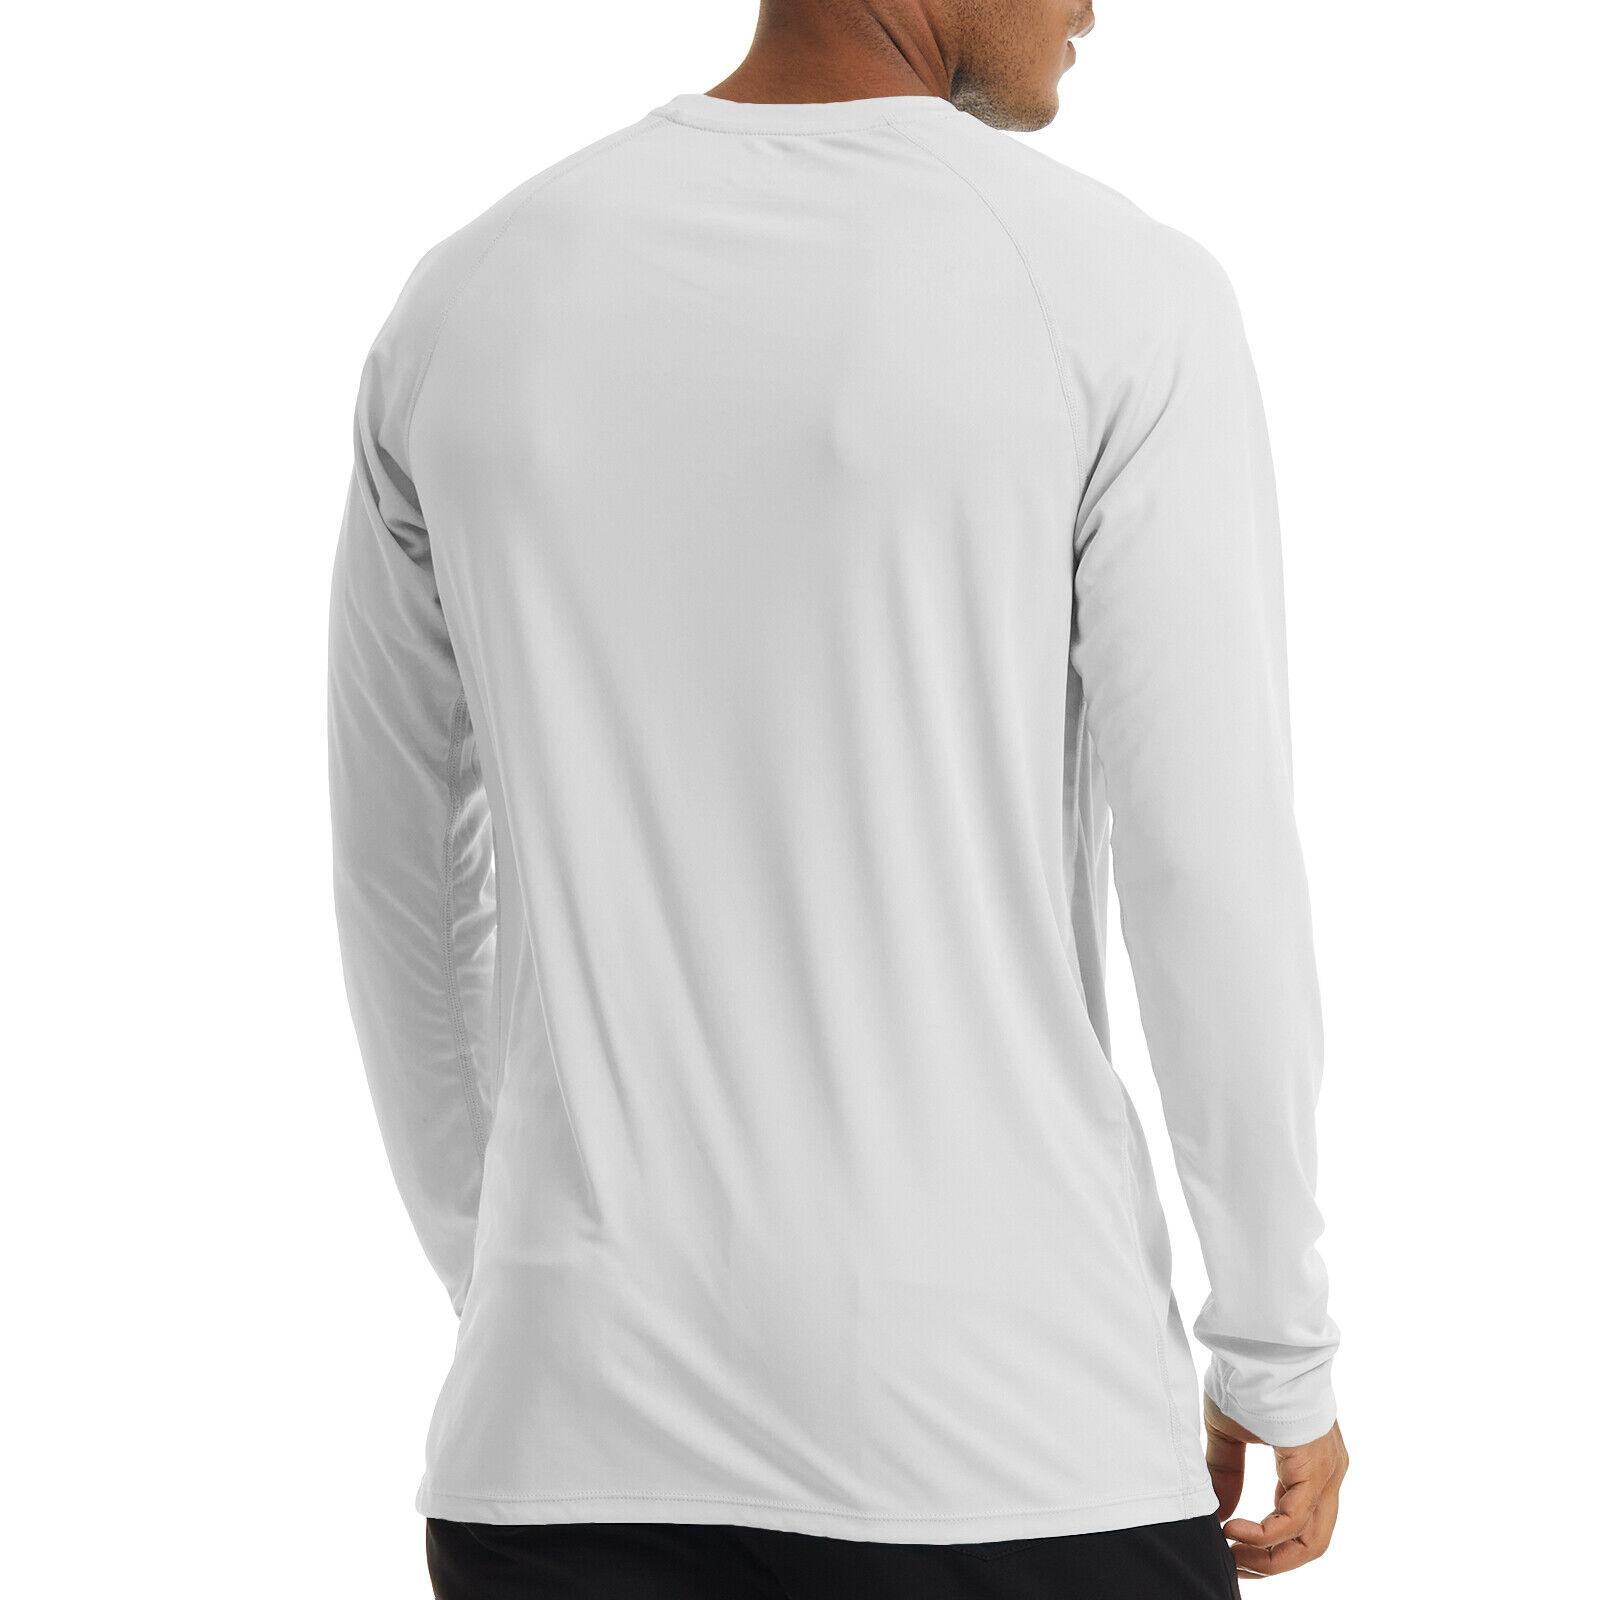 Men's UPF 50+ UV Protection Long Sleeve T-Shirt Sun Block Casual Fishing Shirts 1